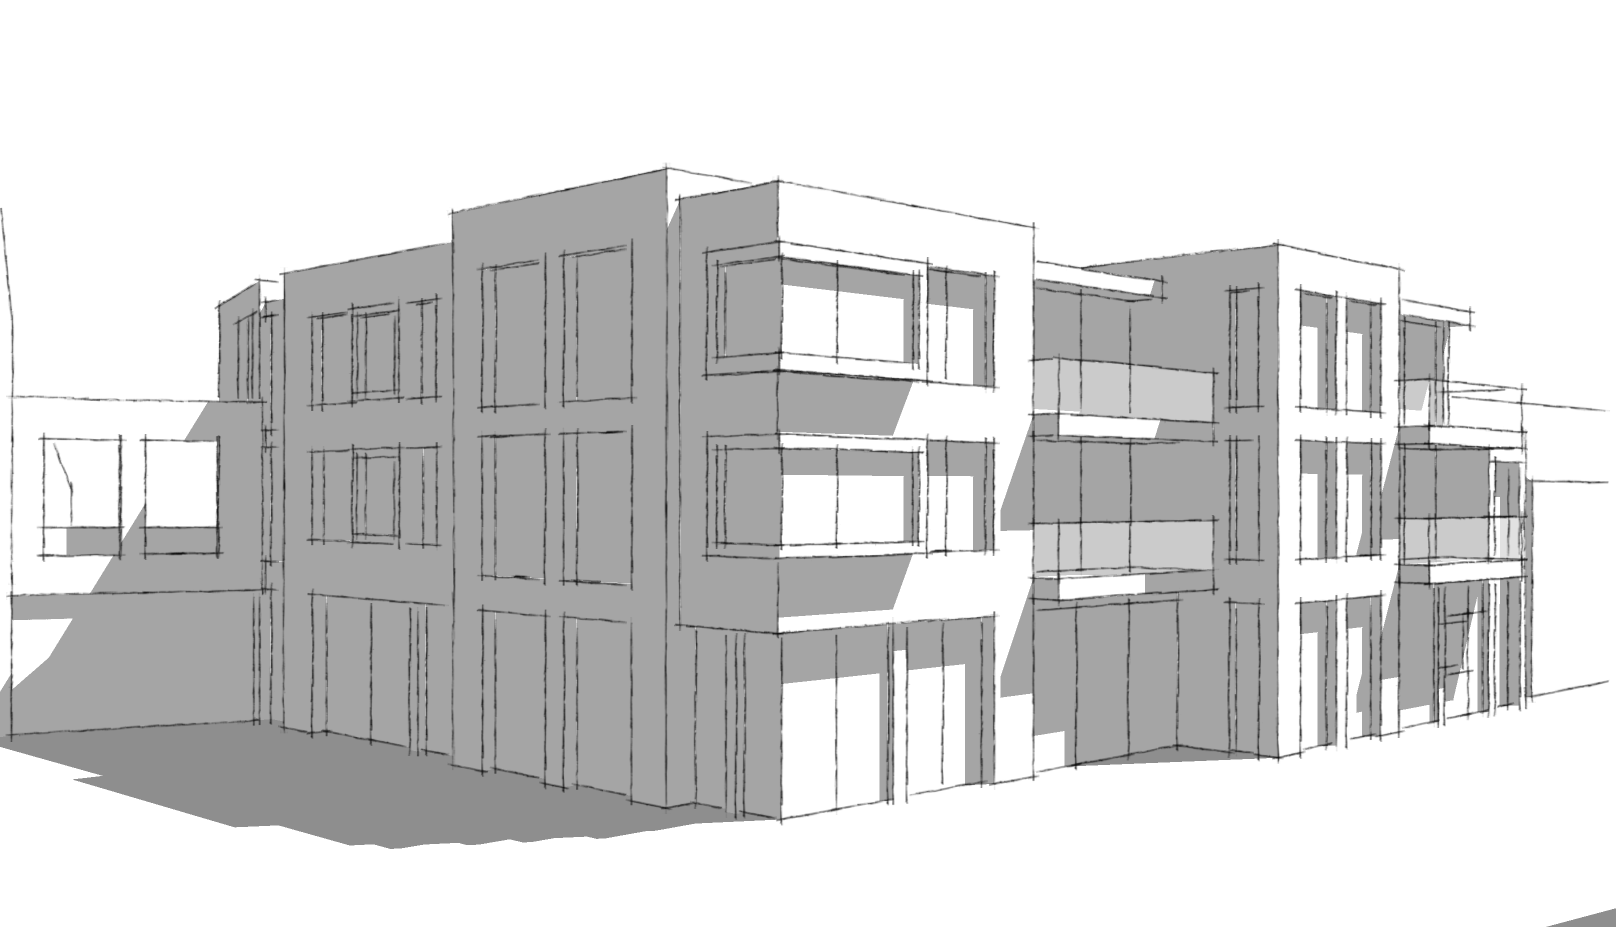 Hendrik-Ido-Ambacht - Utiliteitsbouw - Woningbouw - Kromme Nering Nijverheid